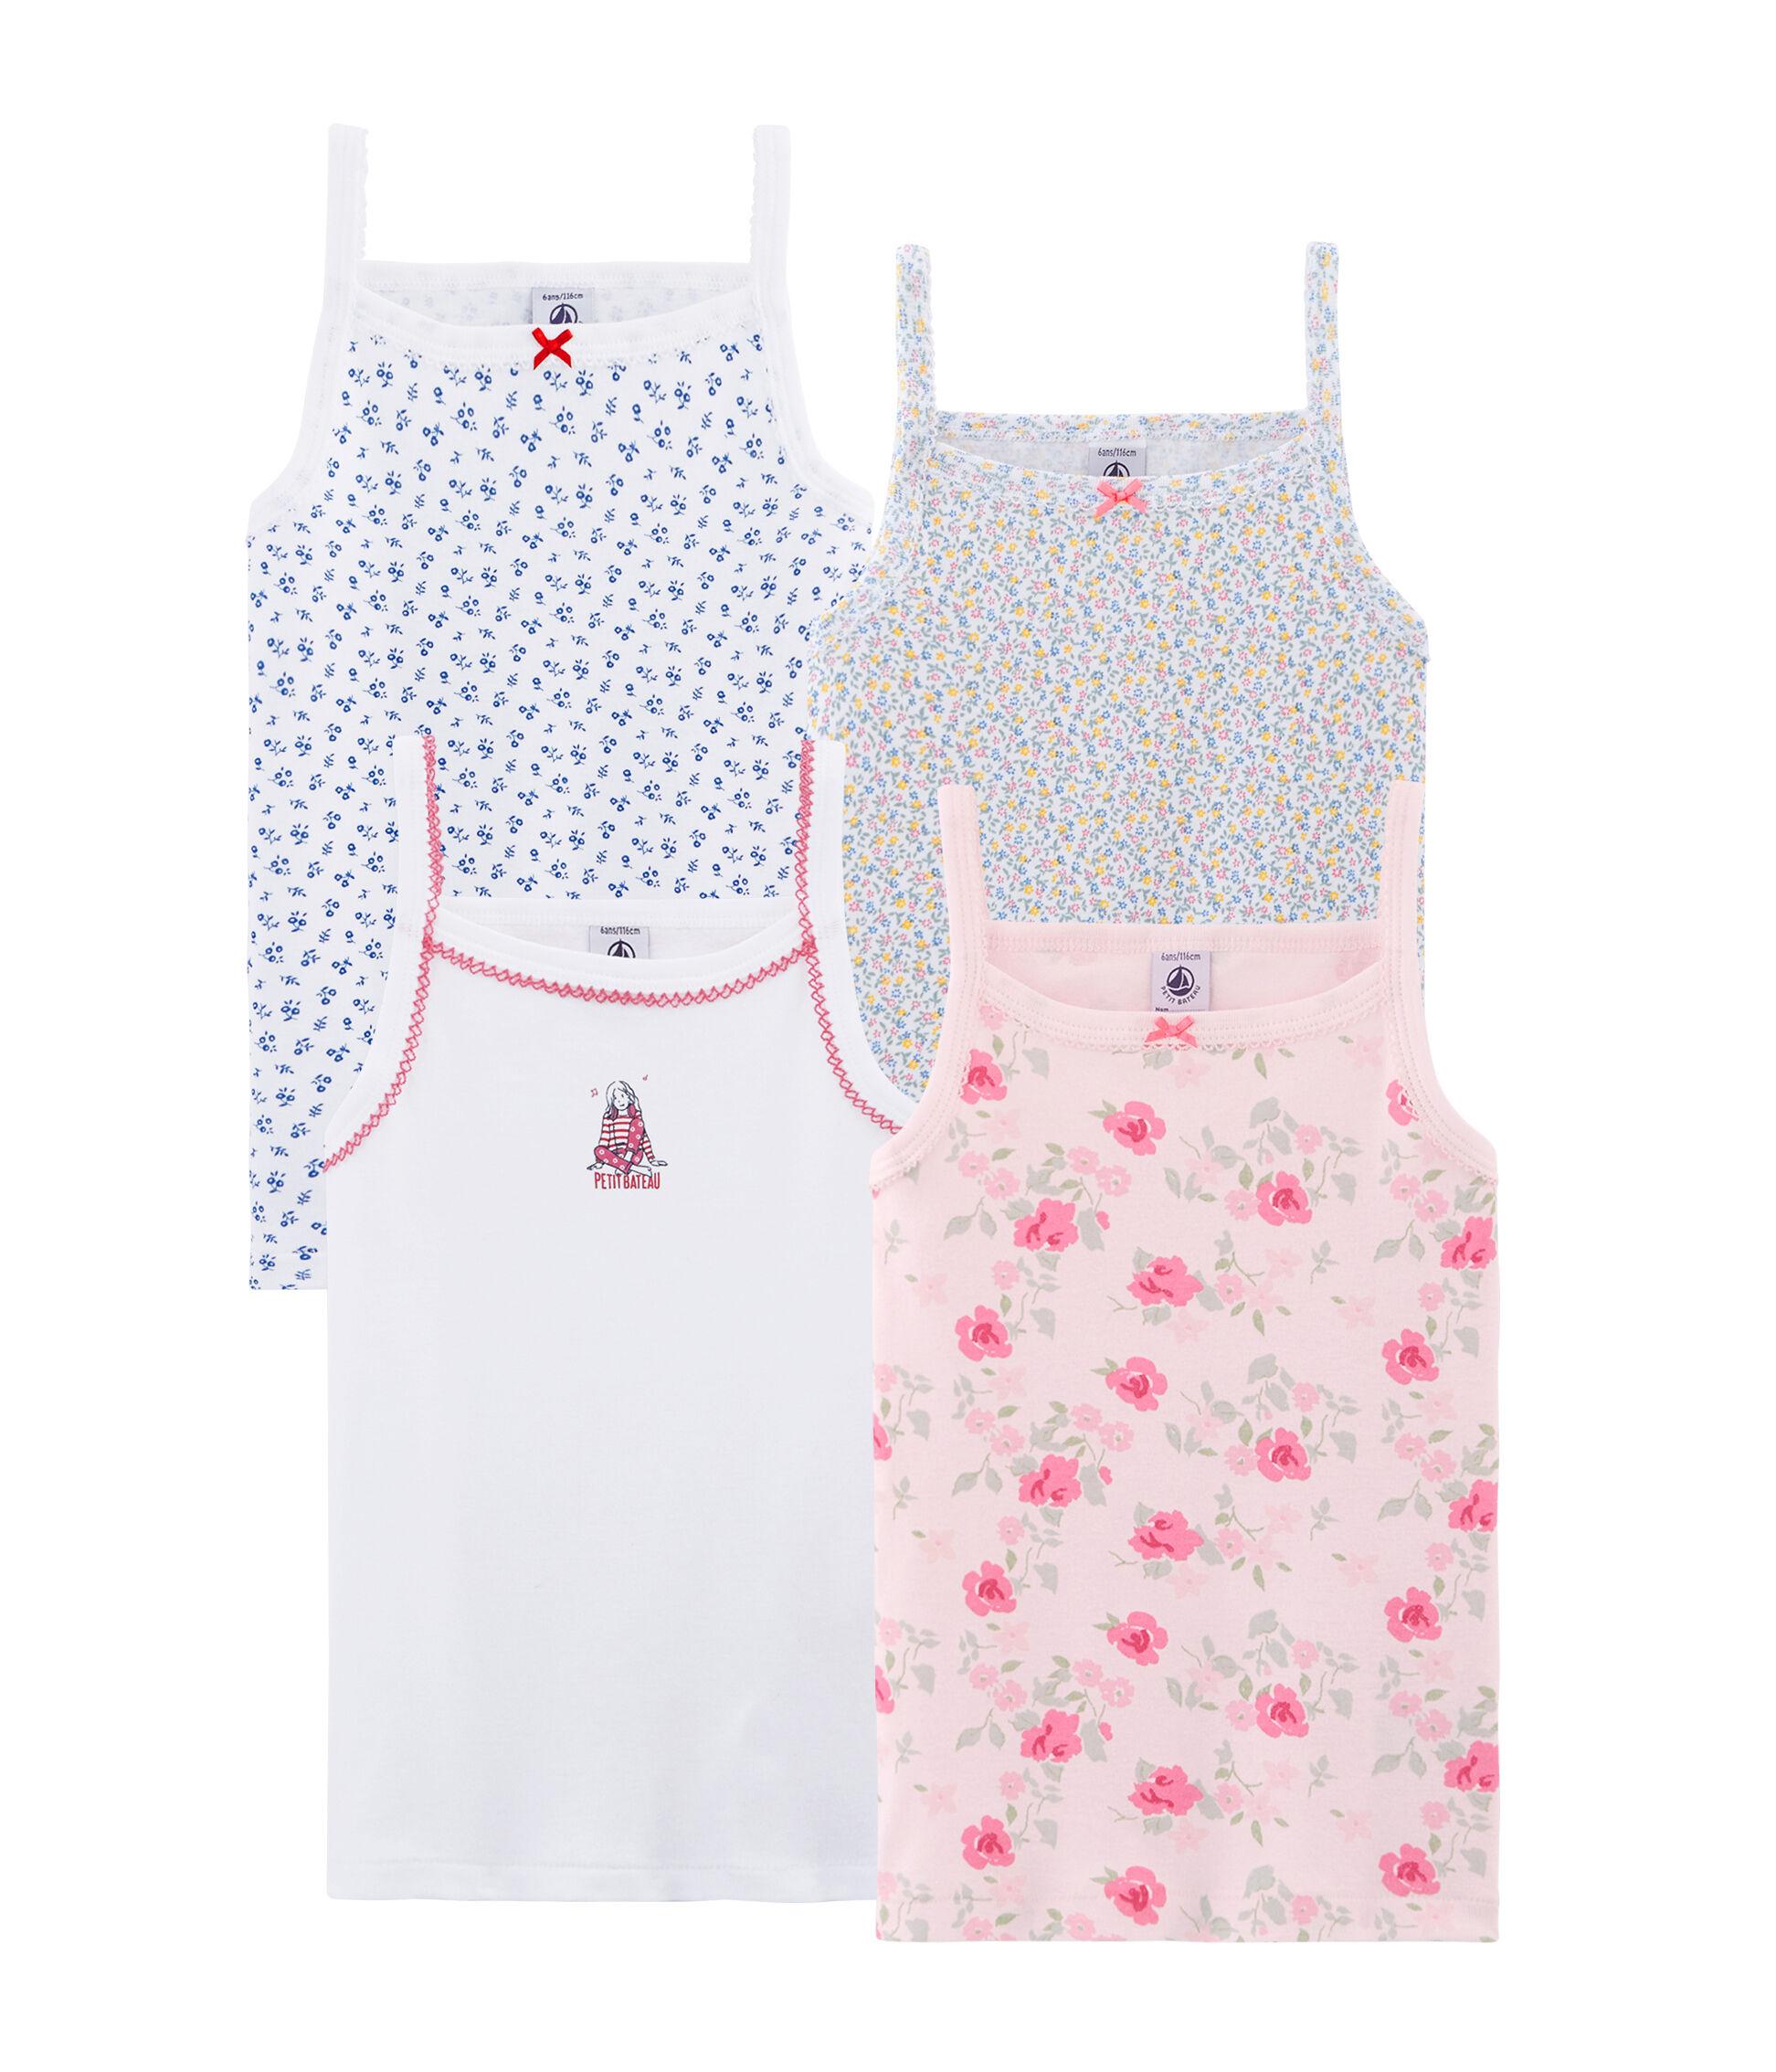 Pink 12 Years Petit Bateau Girls 2-pk Tank Tops